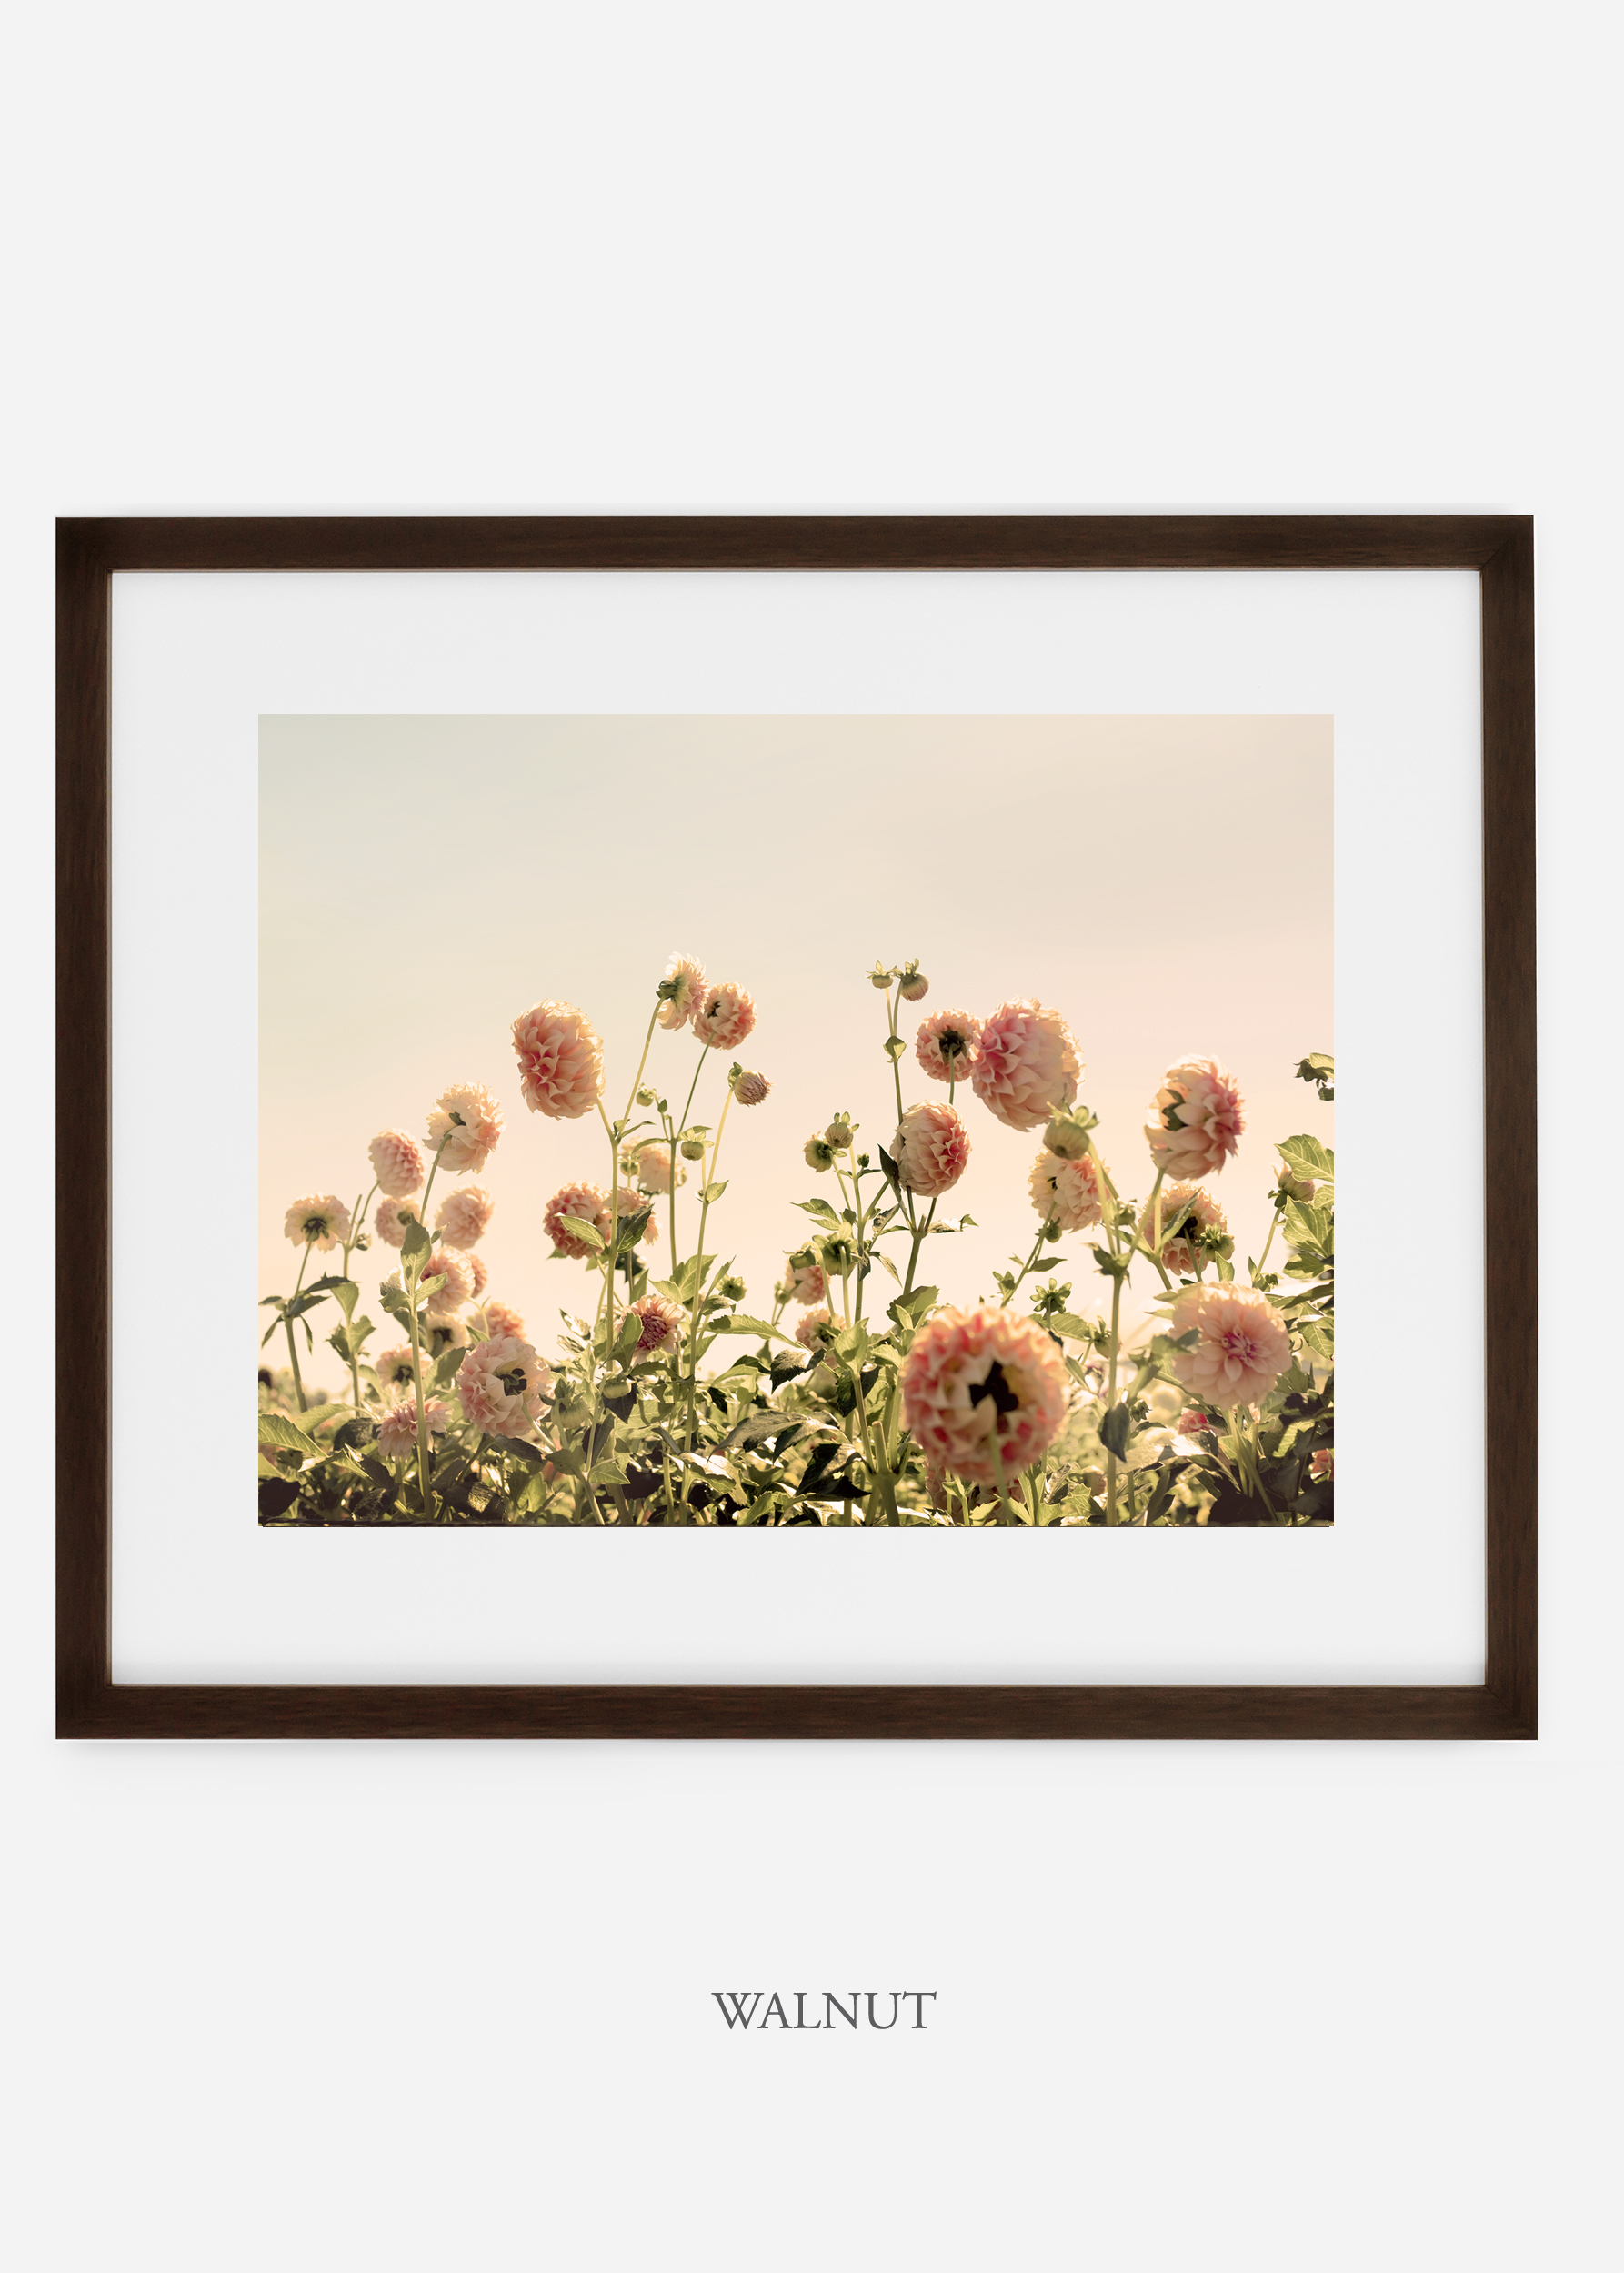 WalnutFrame_DahliaNo.1_WilderCalifornia_Art_Floral_Homedecor_Prints_Dahlia_Botanical_Artwork_Interiordesign.jpg